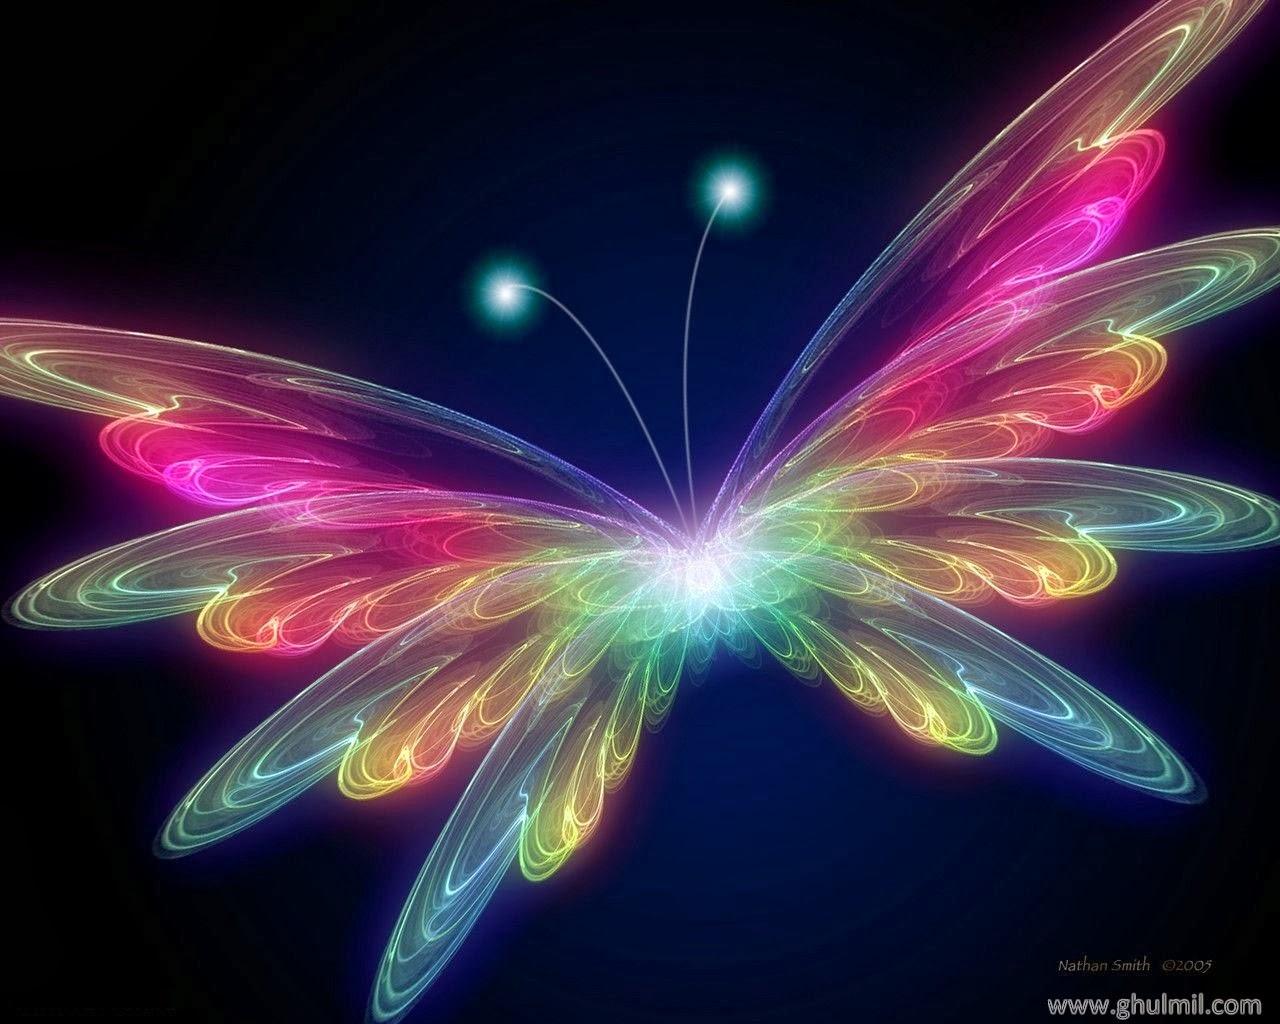 live butterfly wallpaper   beautiful desktop wallpapers 2014 1280x1024